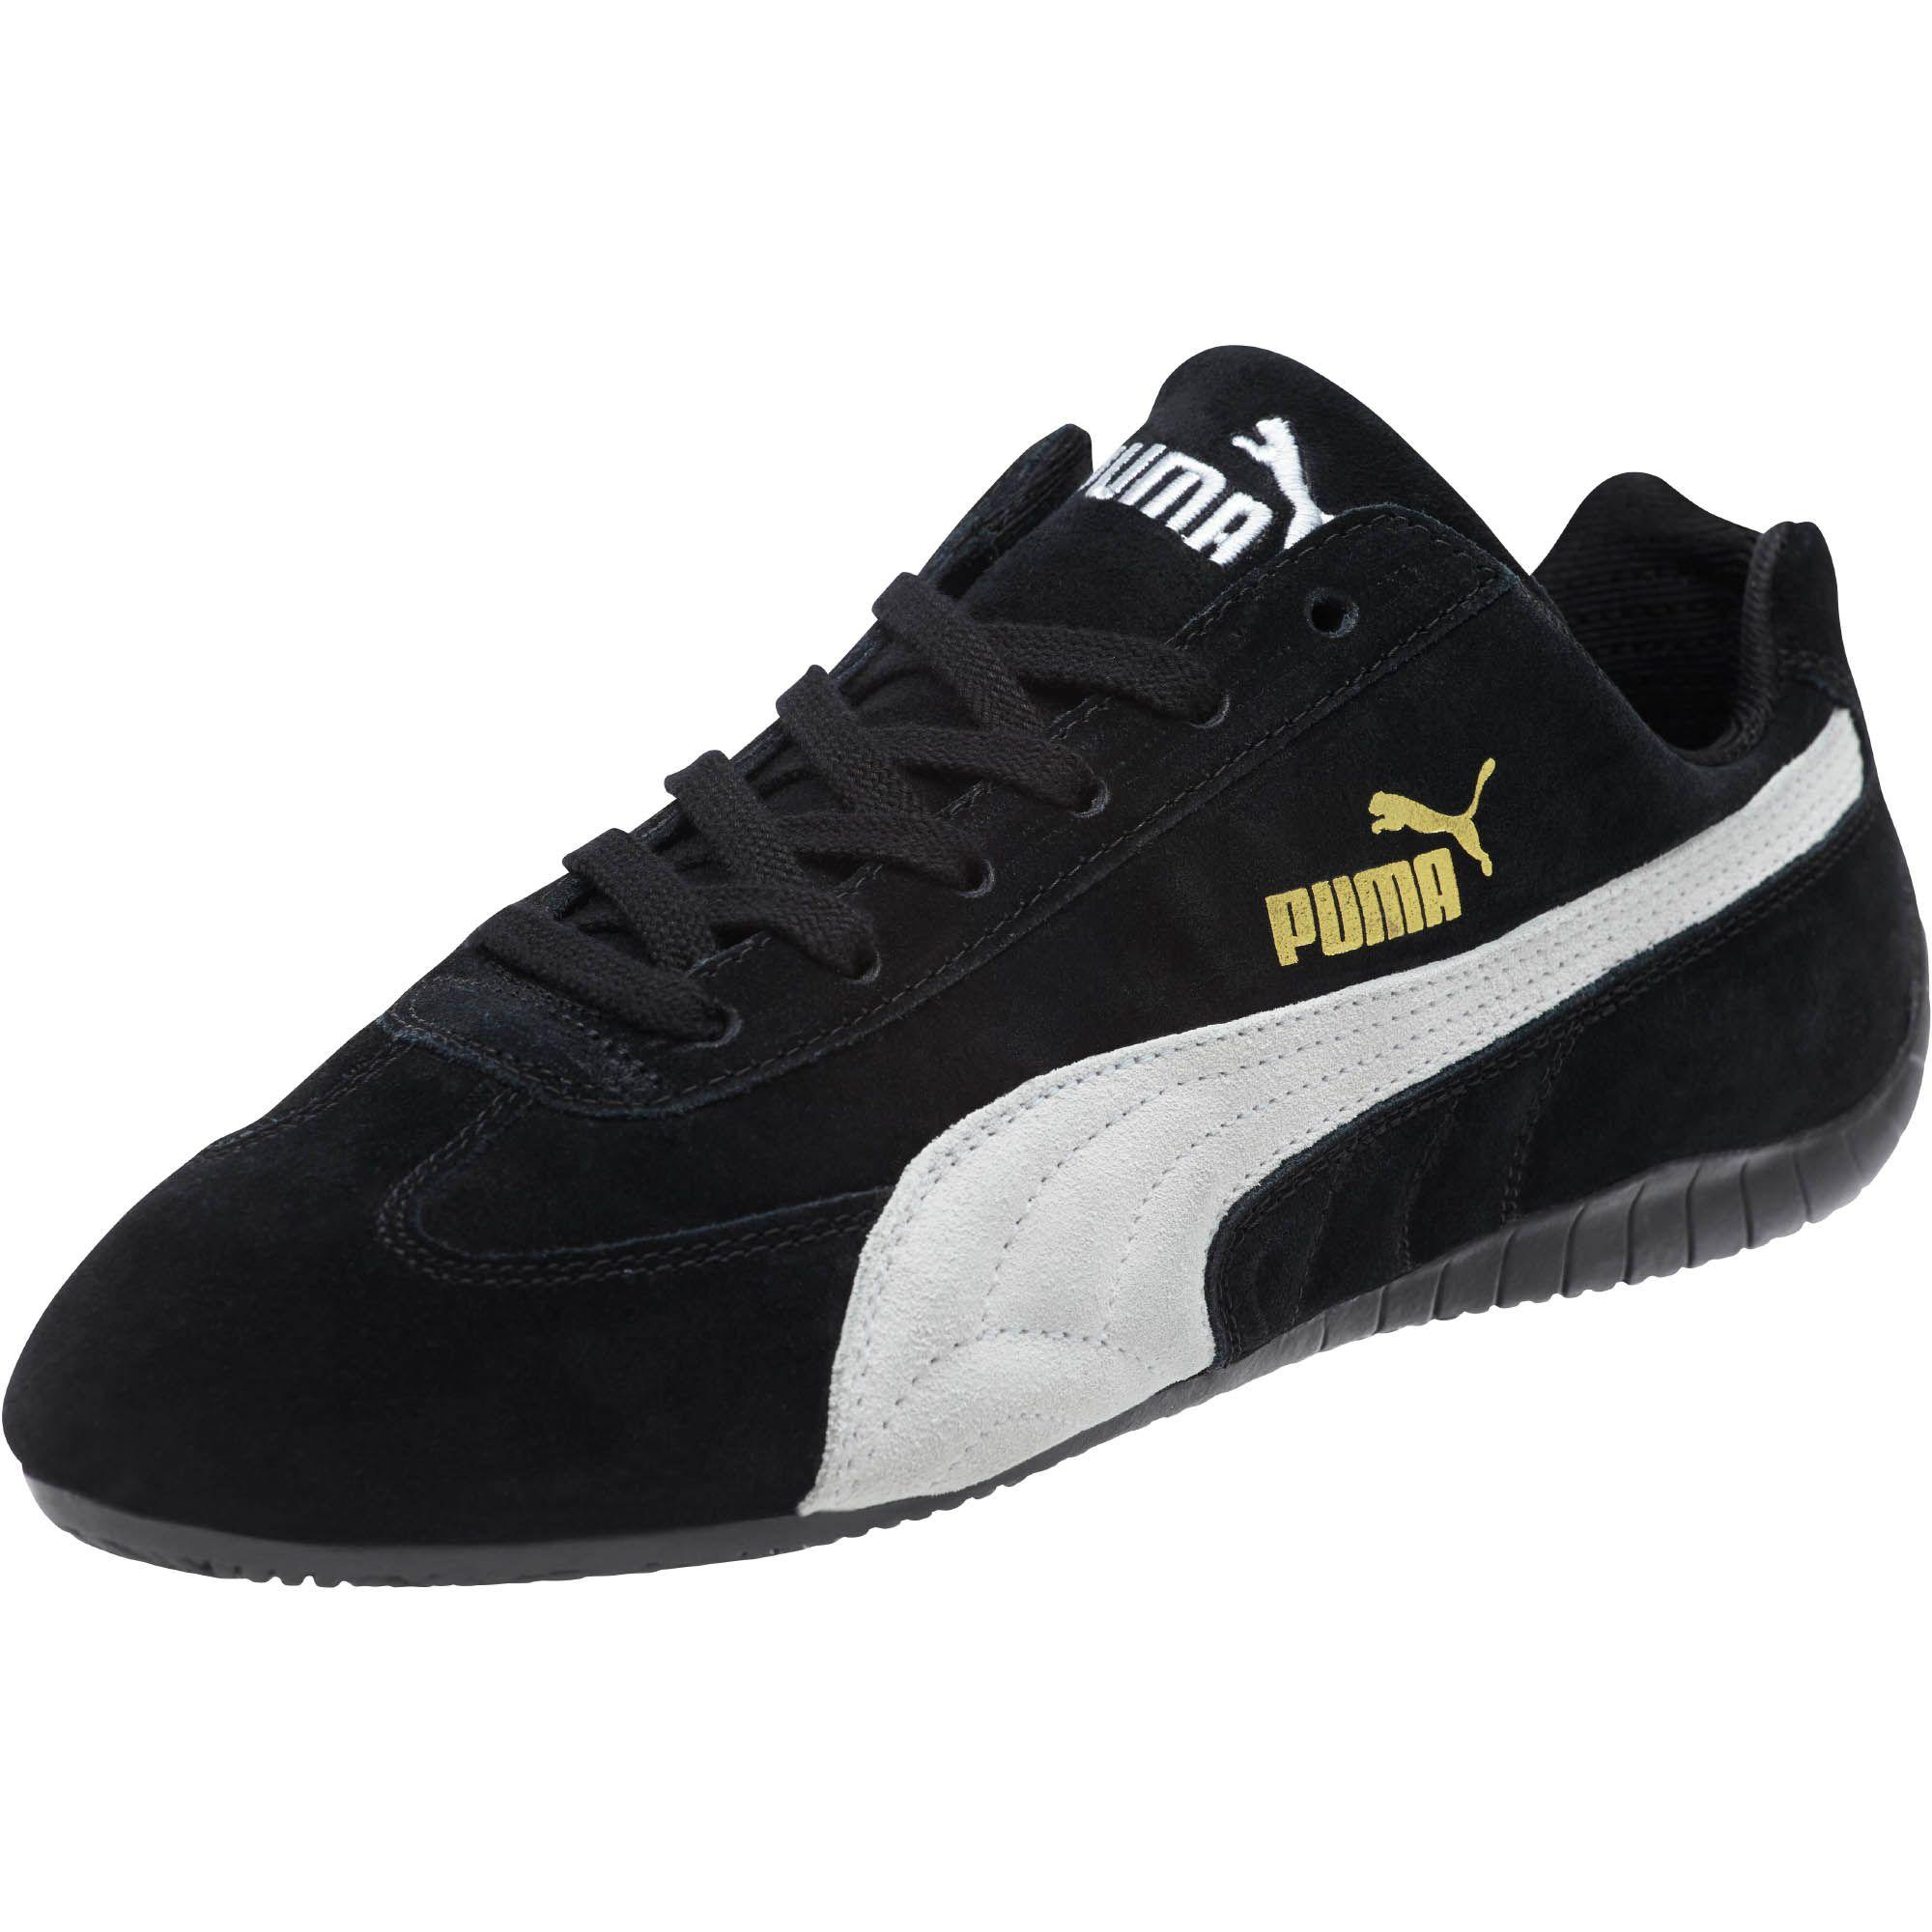 puma speed cat puma-speed-cat-shoes UEEWYWG